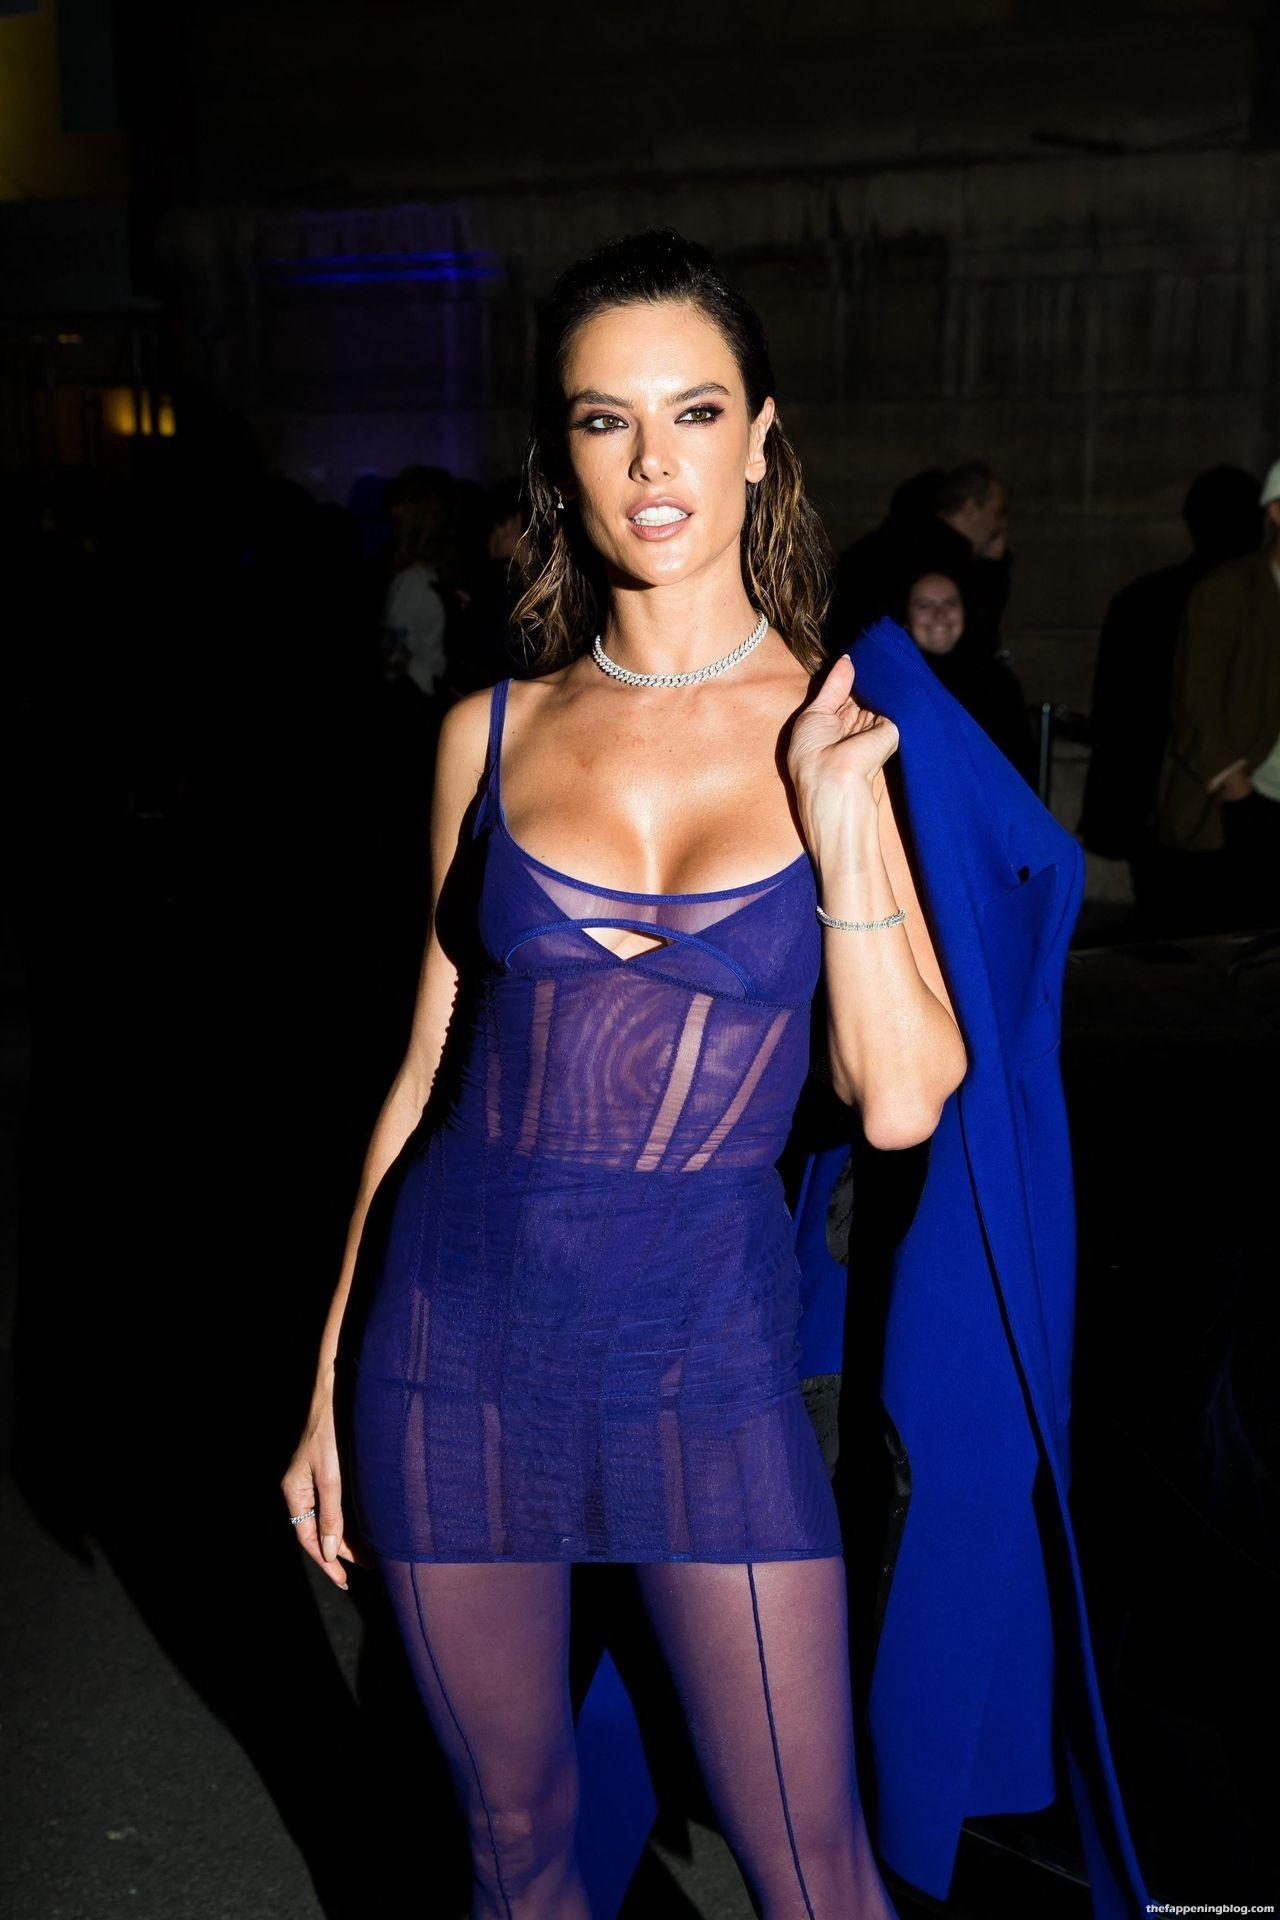 Alessandra-Ambrosio-Sexy-The-Fappening-Blog-16-3.jpg